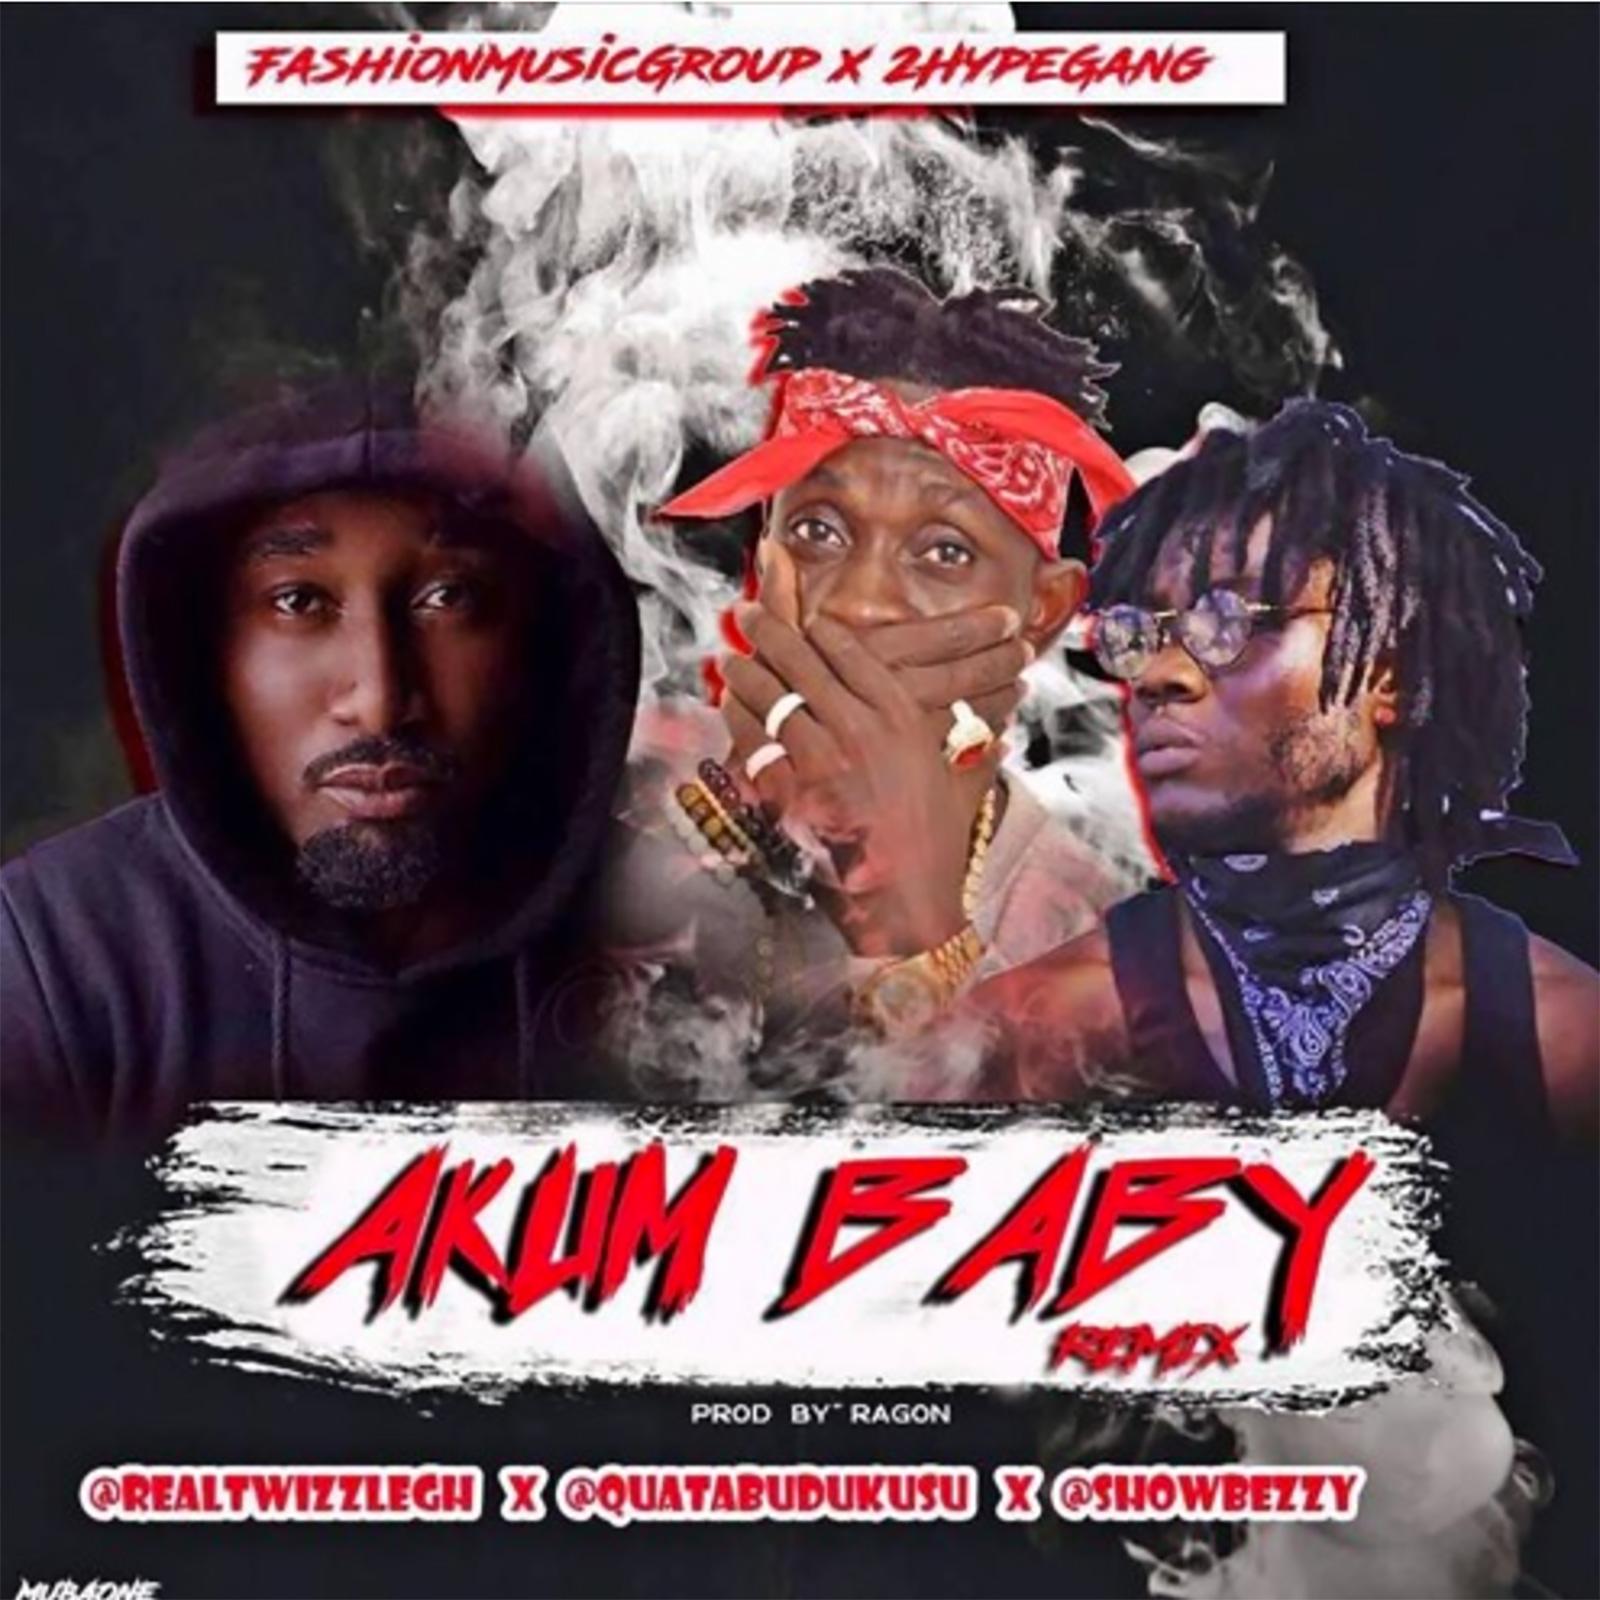 Akum Baby(Remix) by T-Wizzle feat. Showbezzy & Quata Budukusu